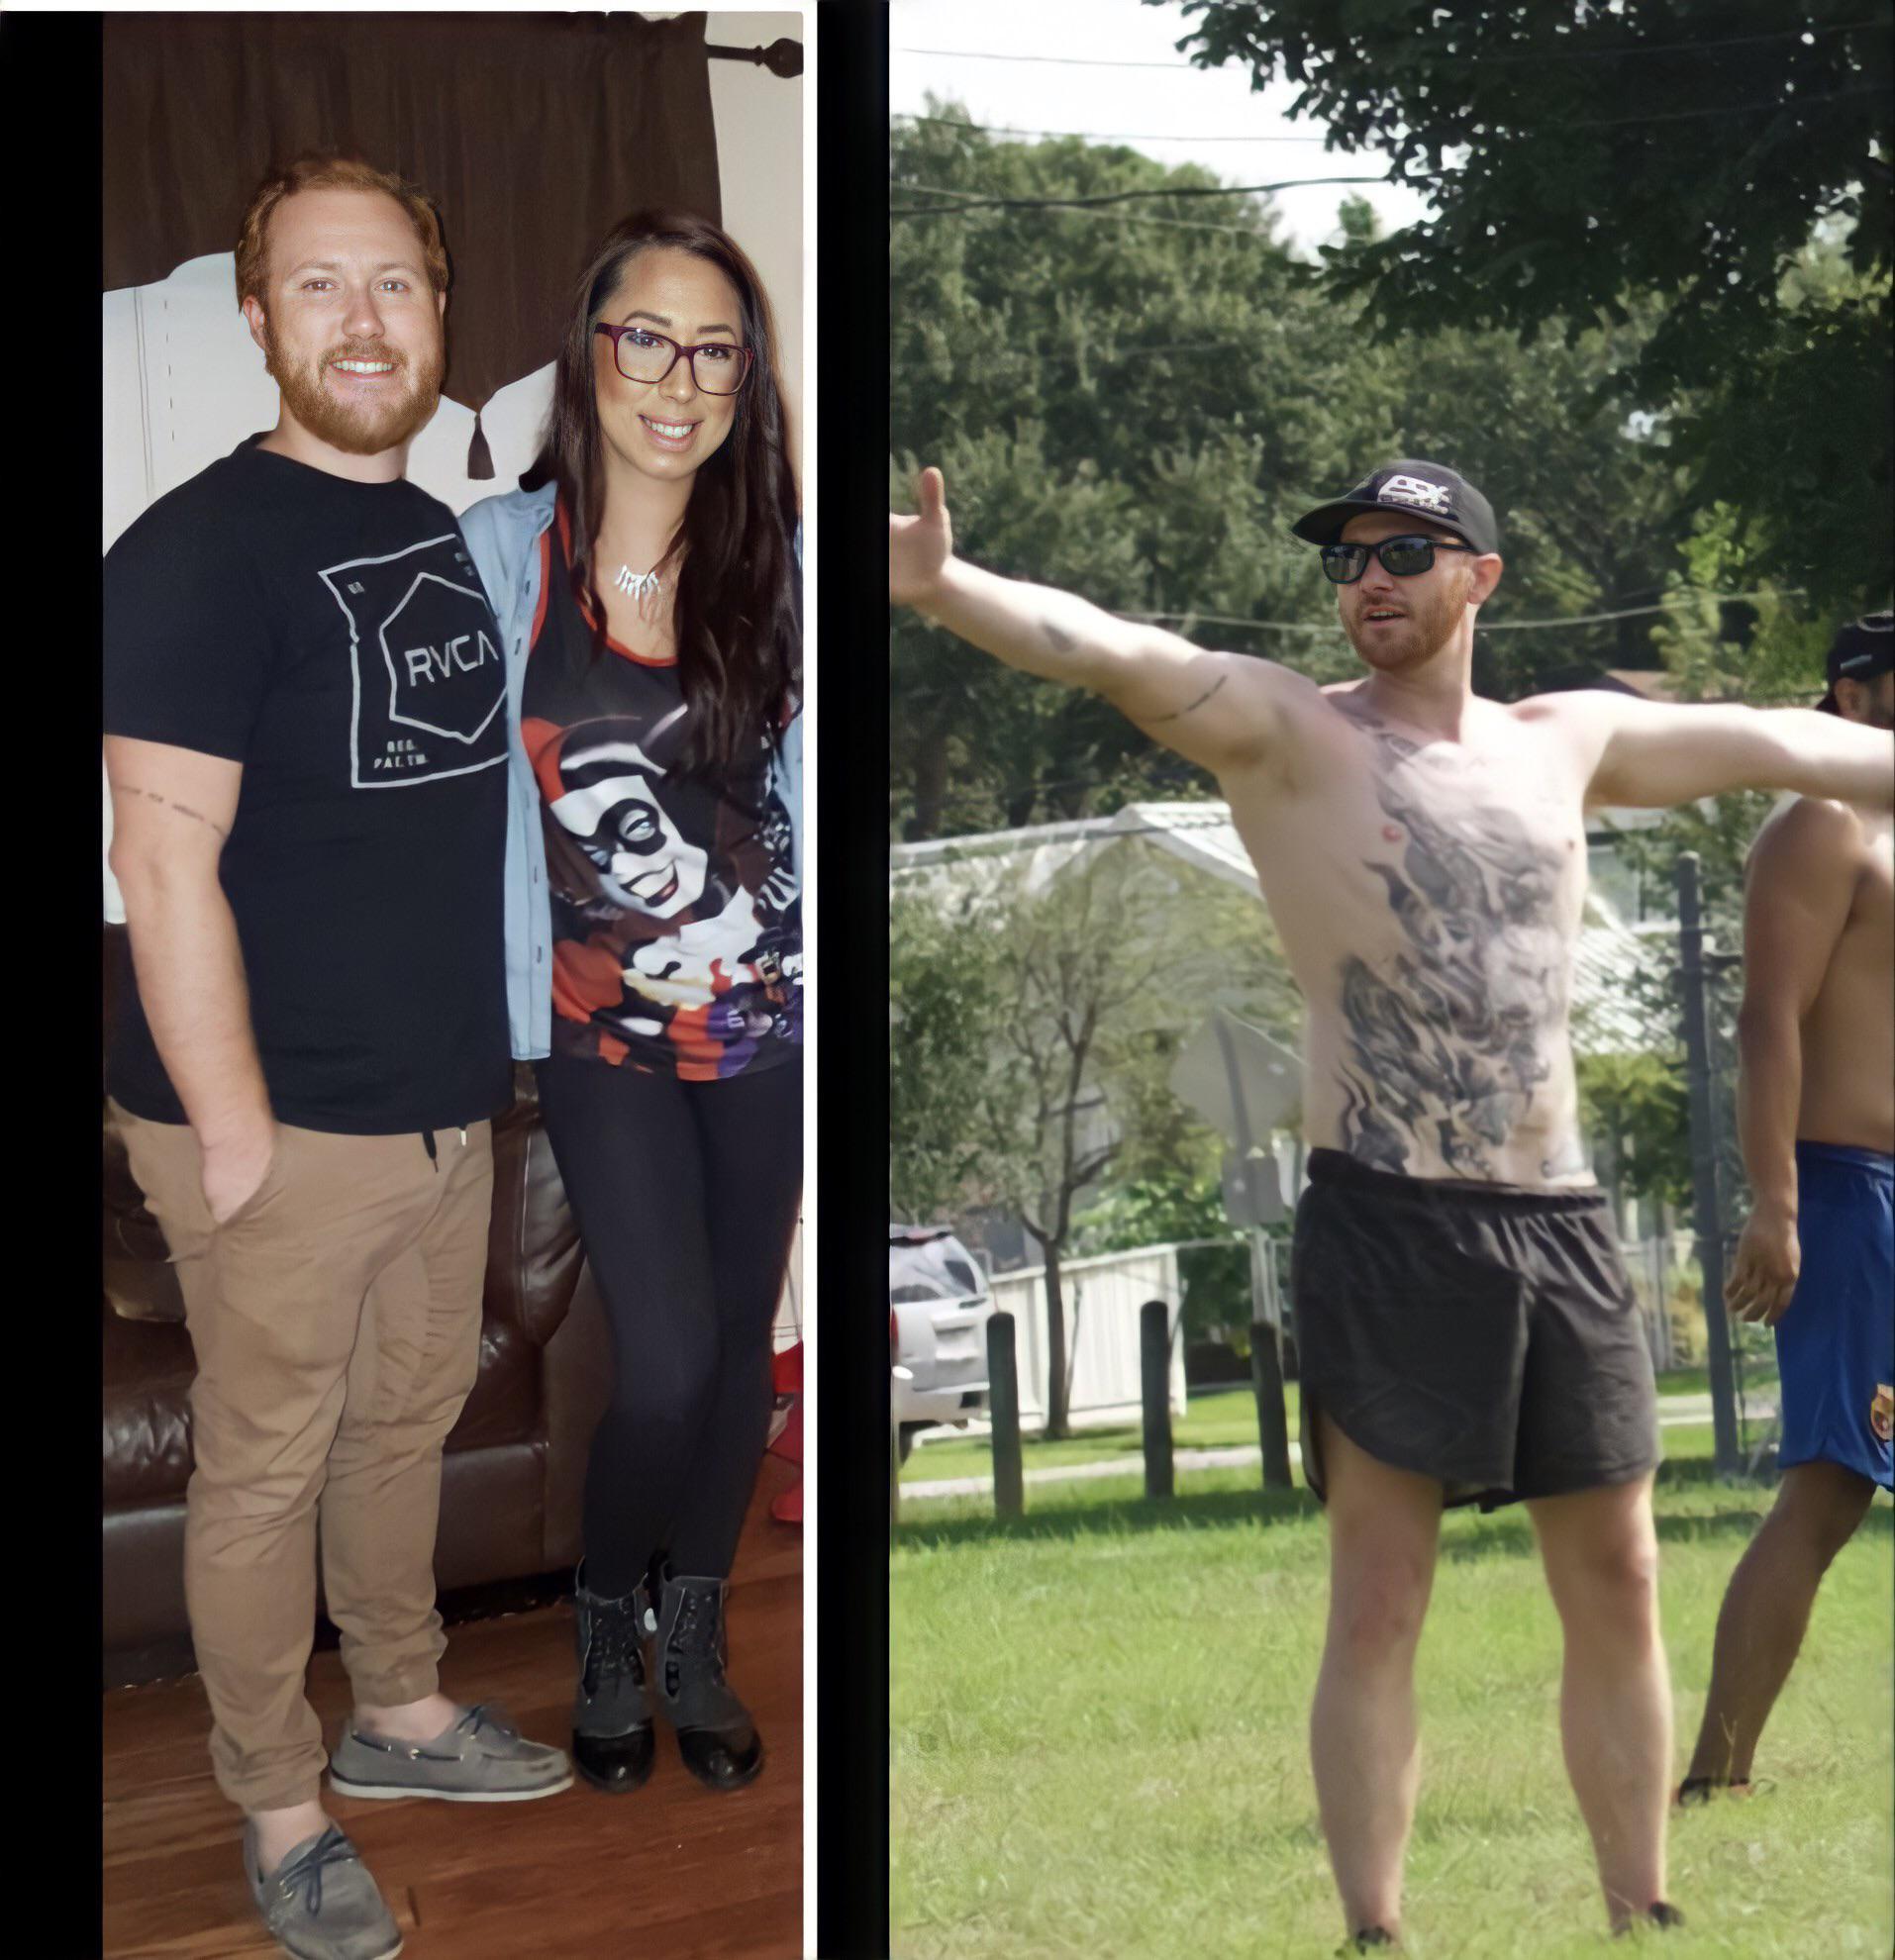 Progress Pics of 64 lbs Weight Loss 5'9 Male 218 lbs to 154 lbs